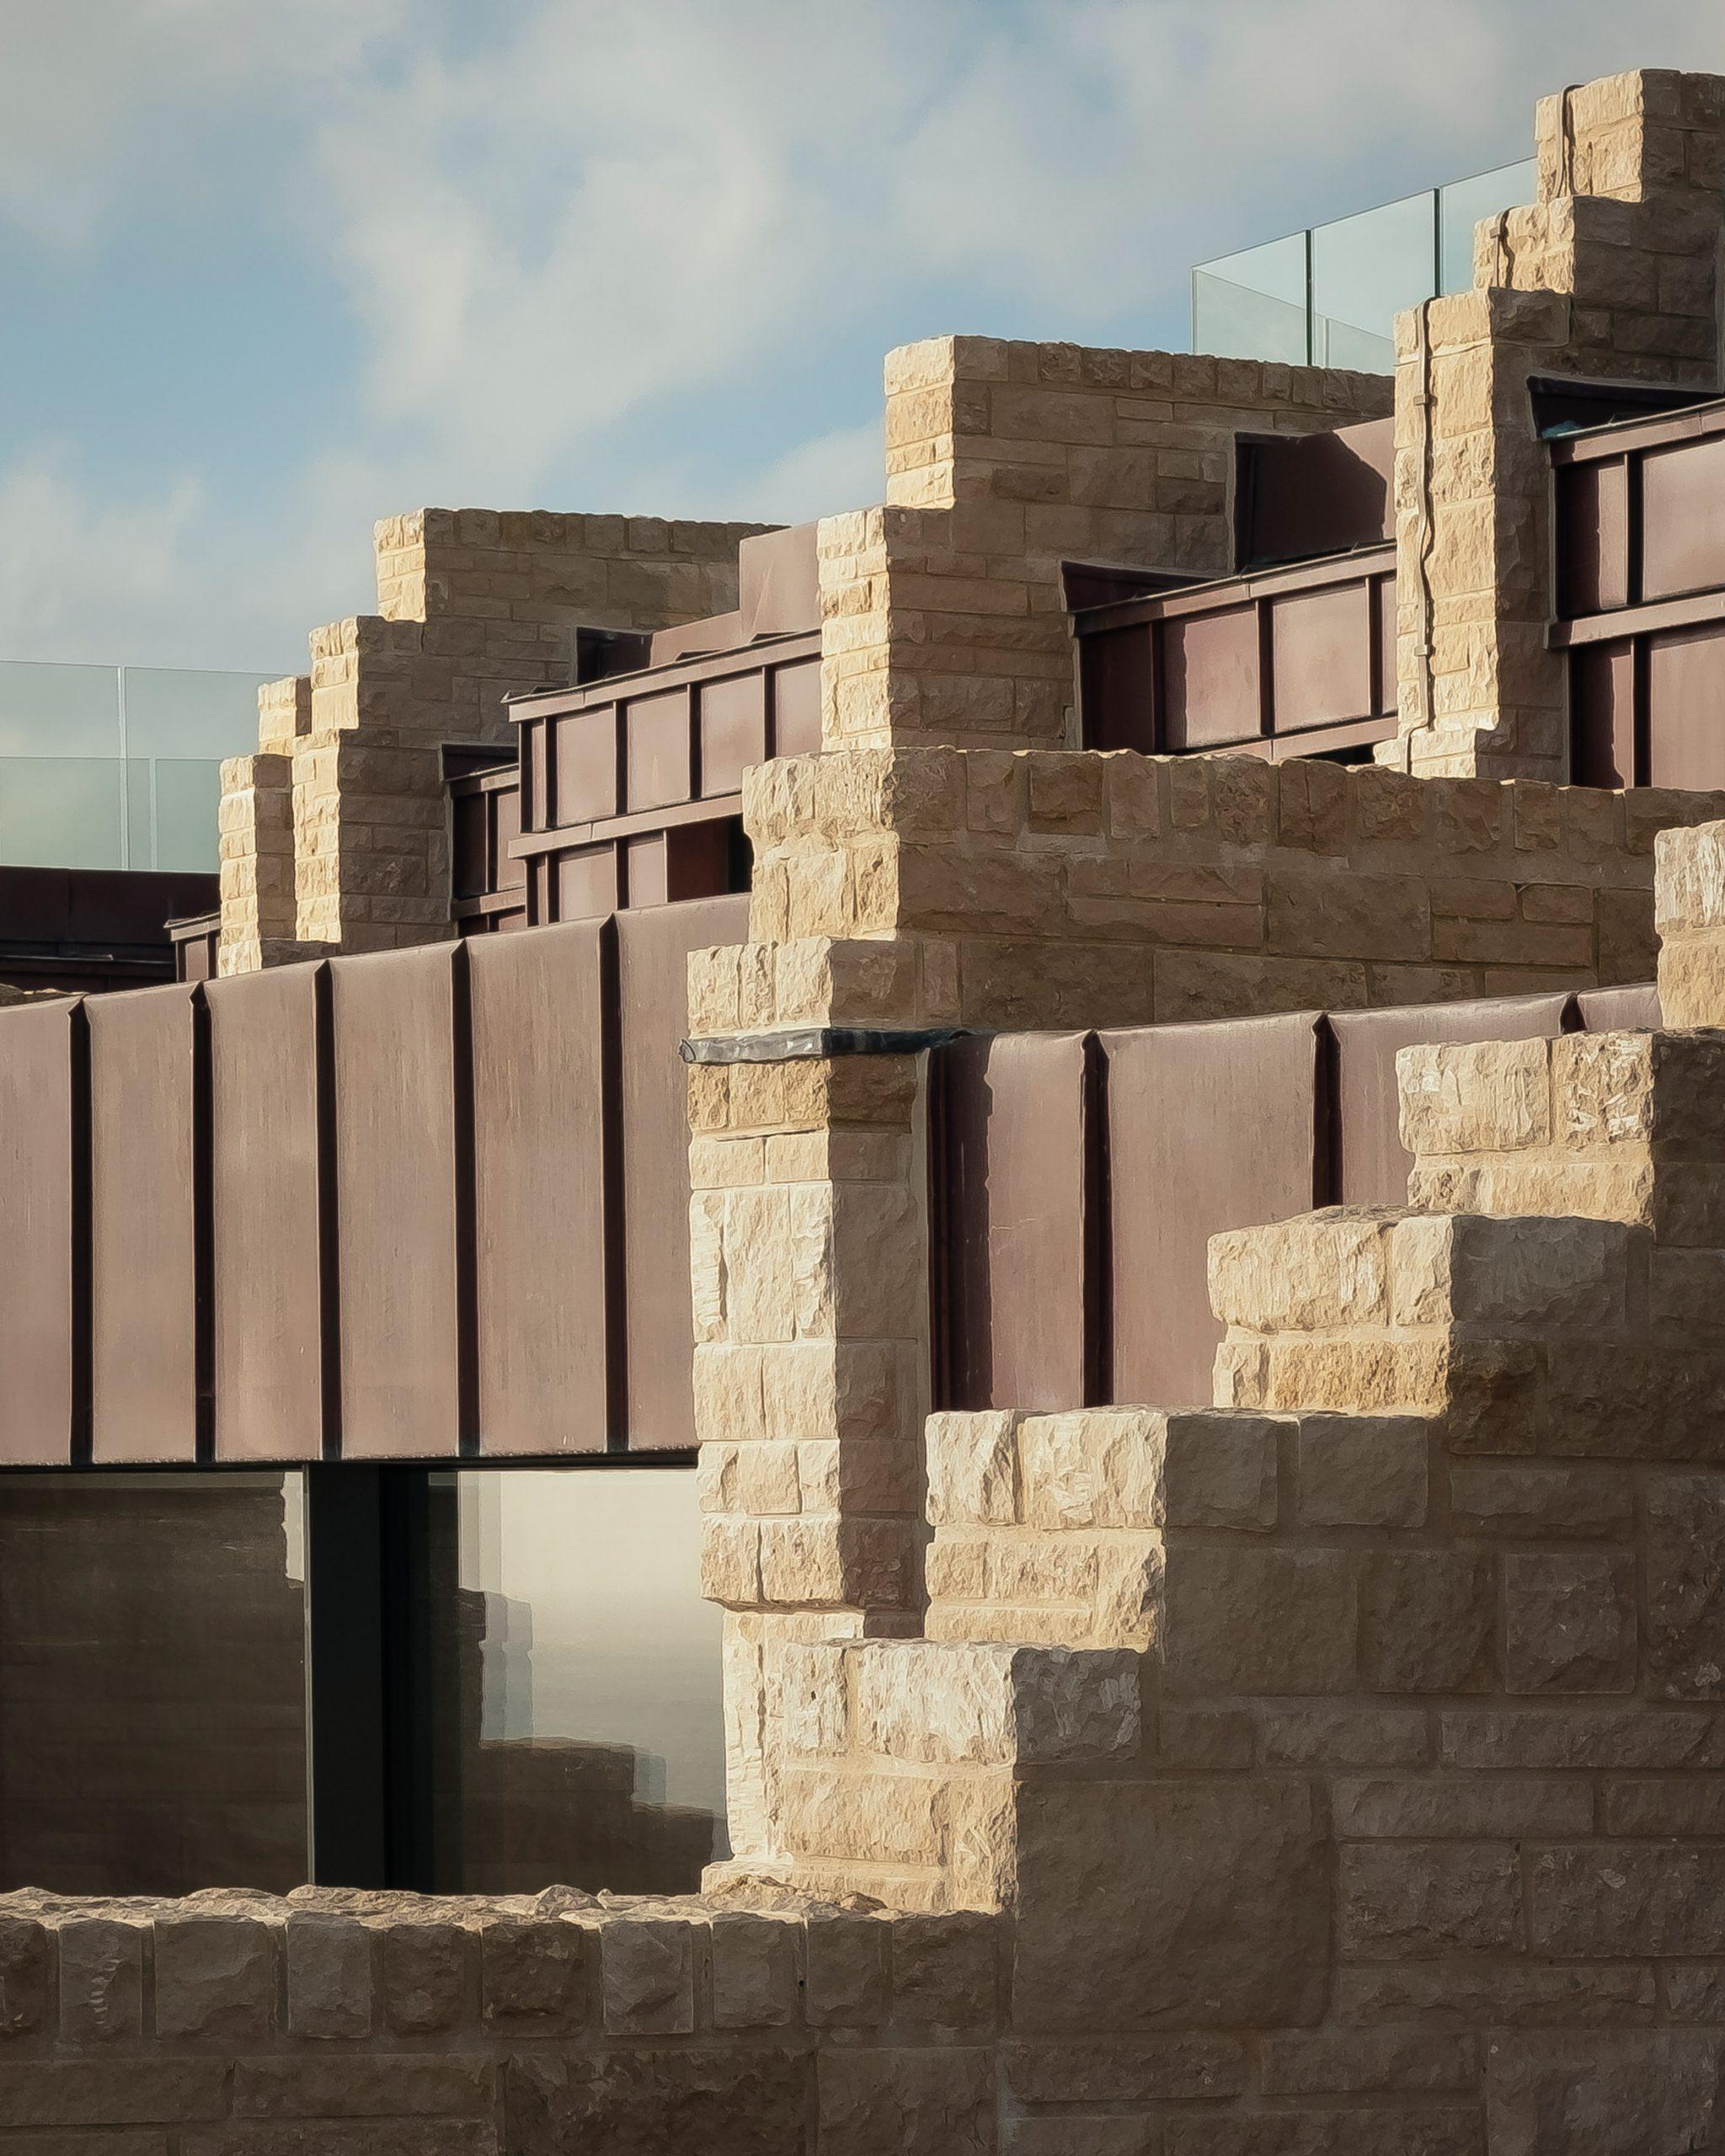 Stone blocks create a rugged look